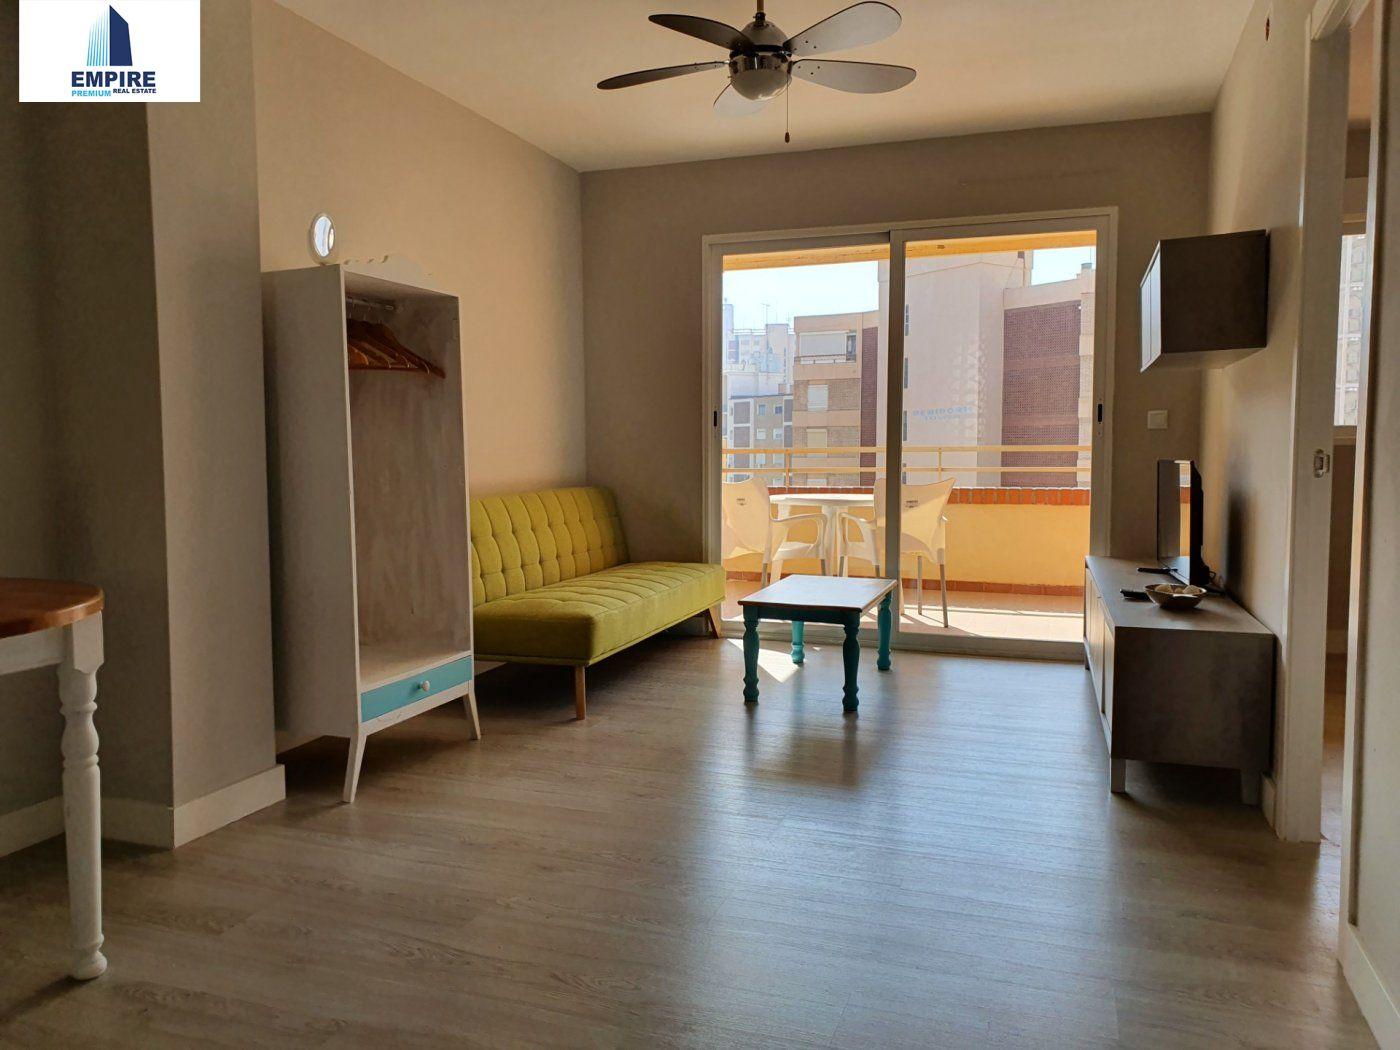 apartamento en benidorm · rincon-de-loix 0€